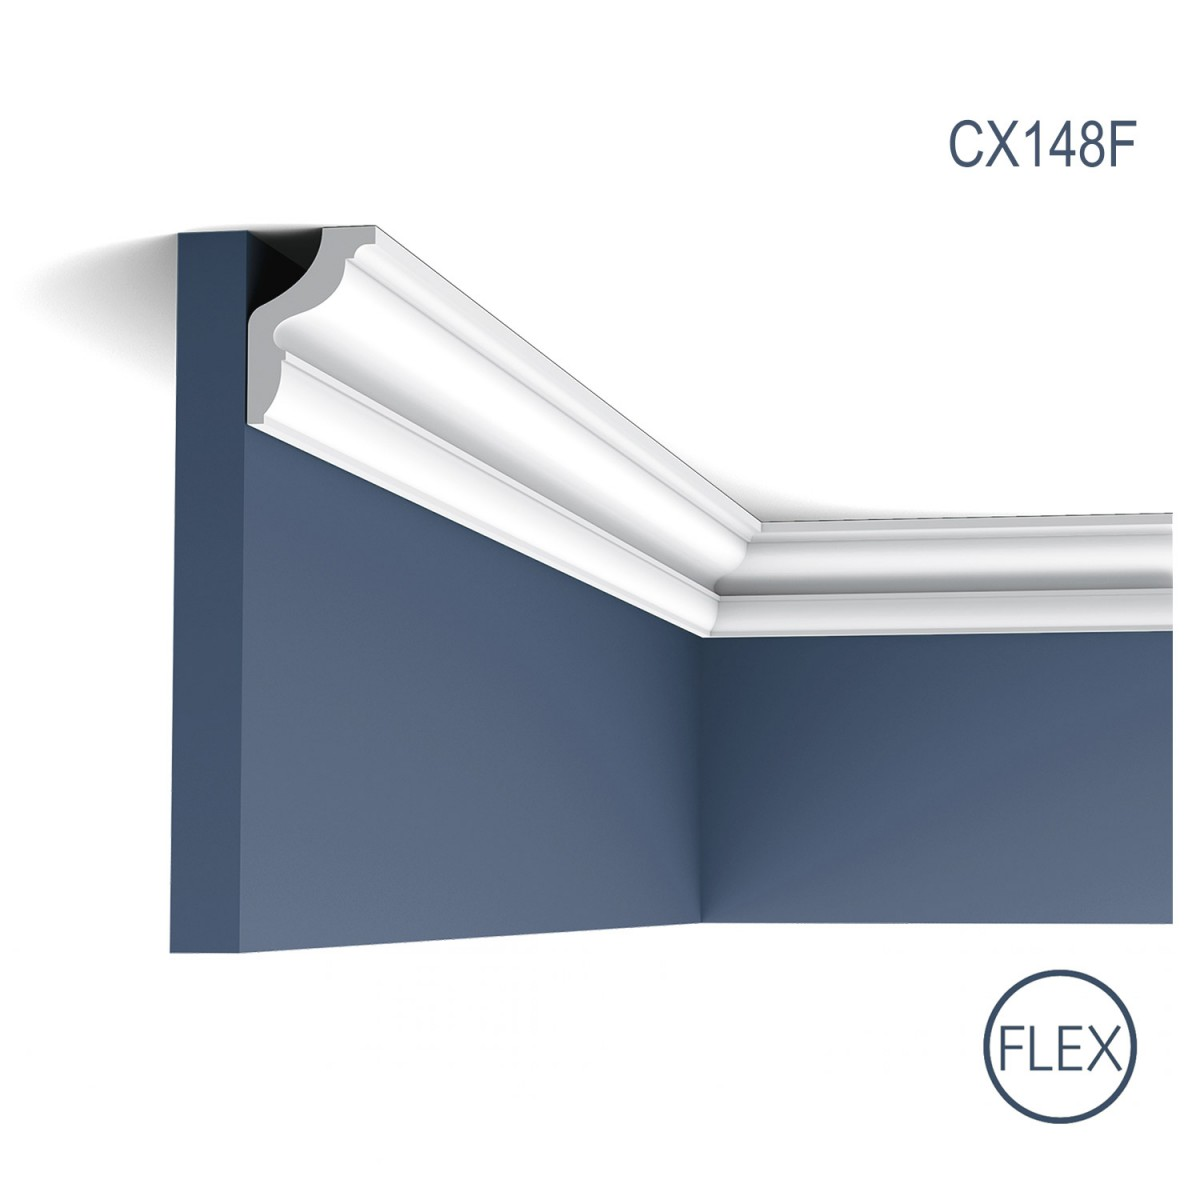 Cornisa Flex Axxent CX148F, Dimensiuni: 200 X 4.3 X 2.9 cm, Orac Decor